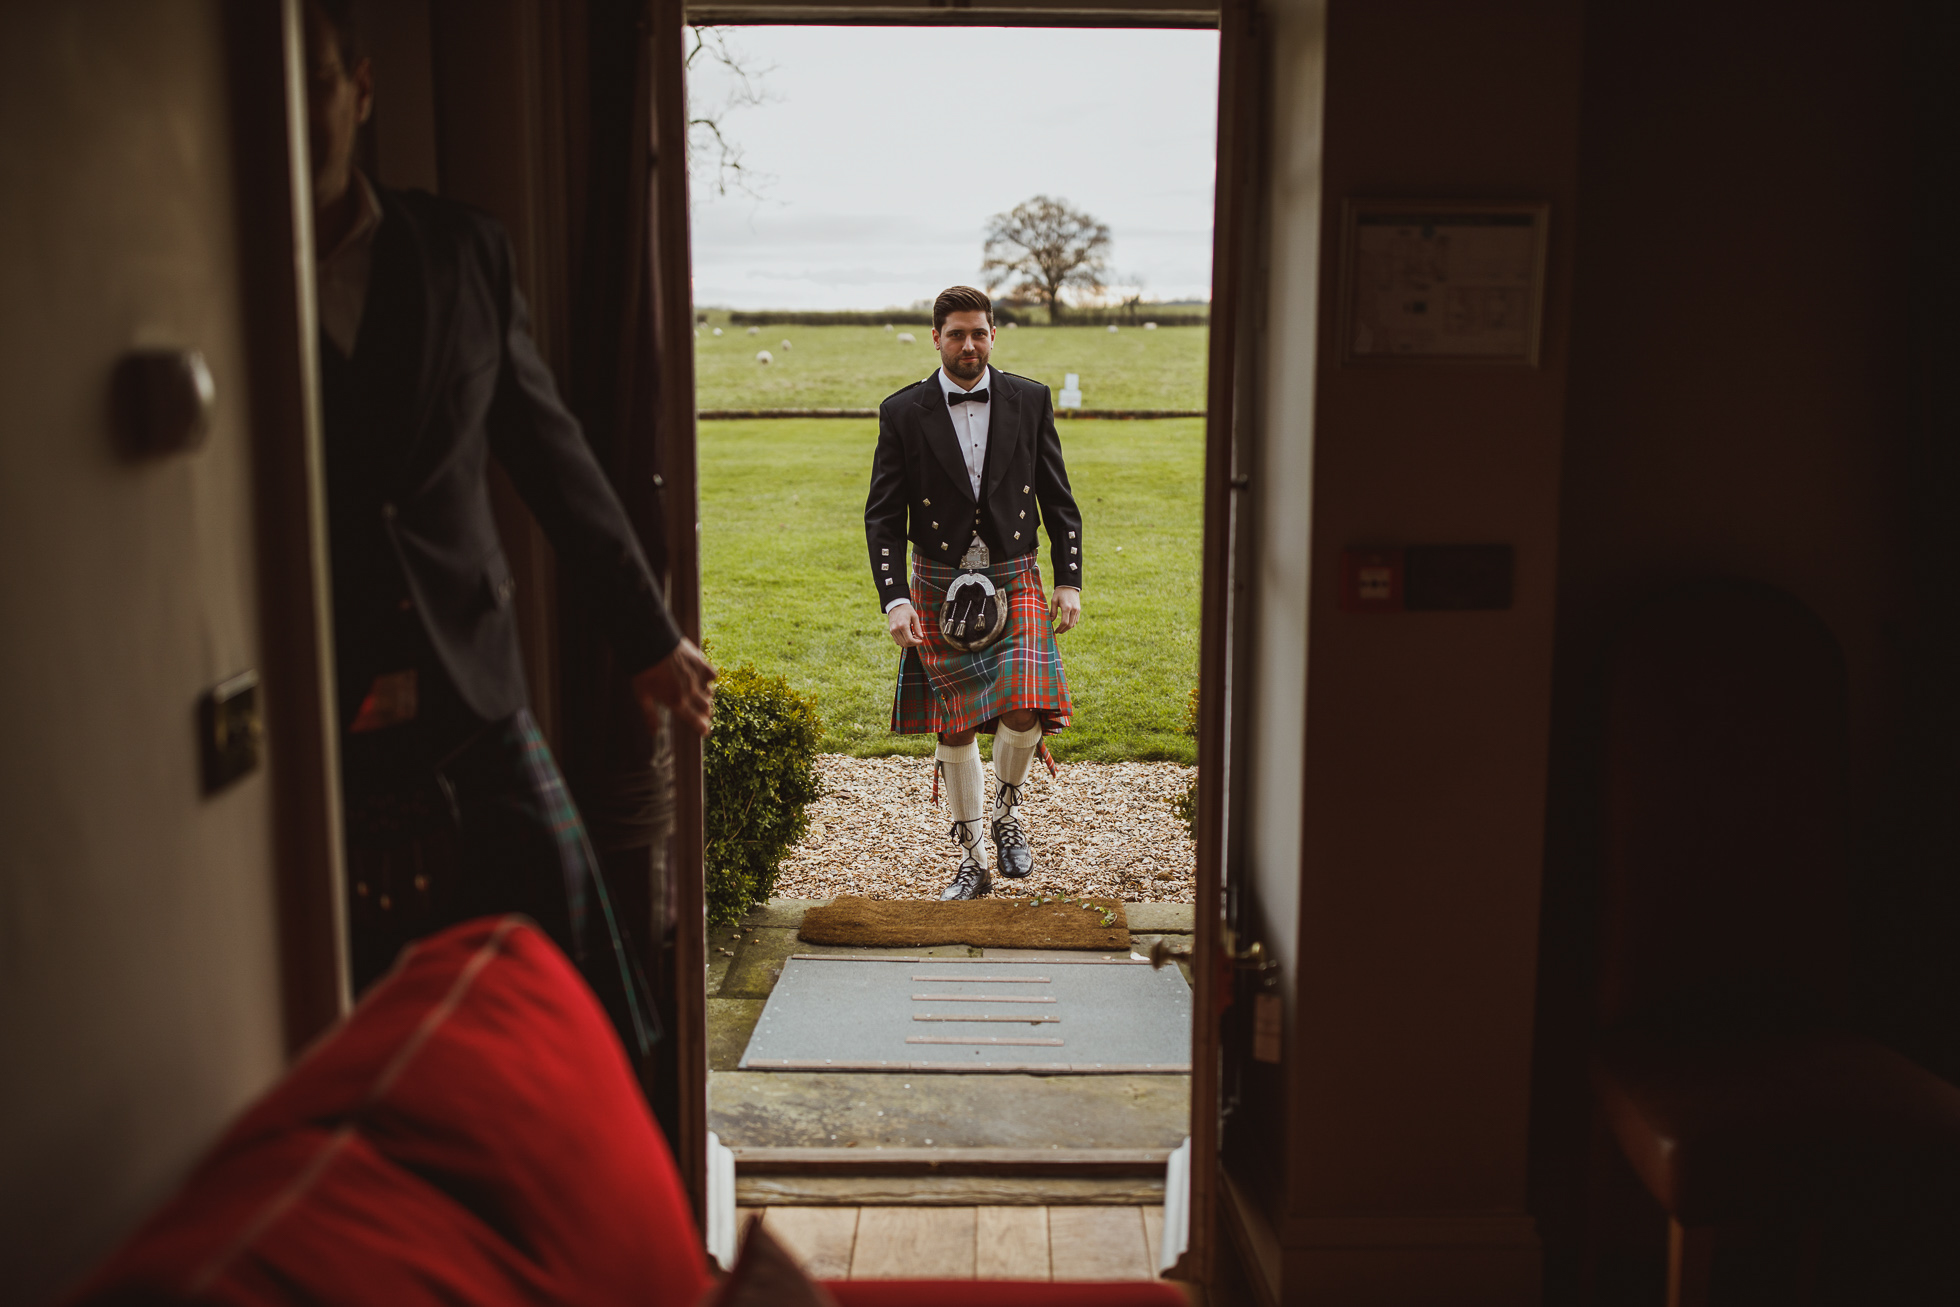 hornington_manor_wedding_photographer-24.jpg